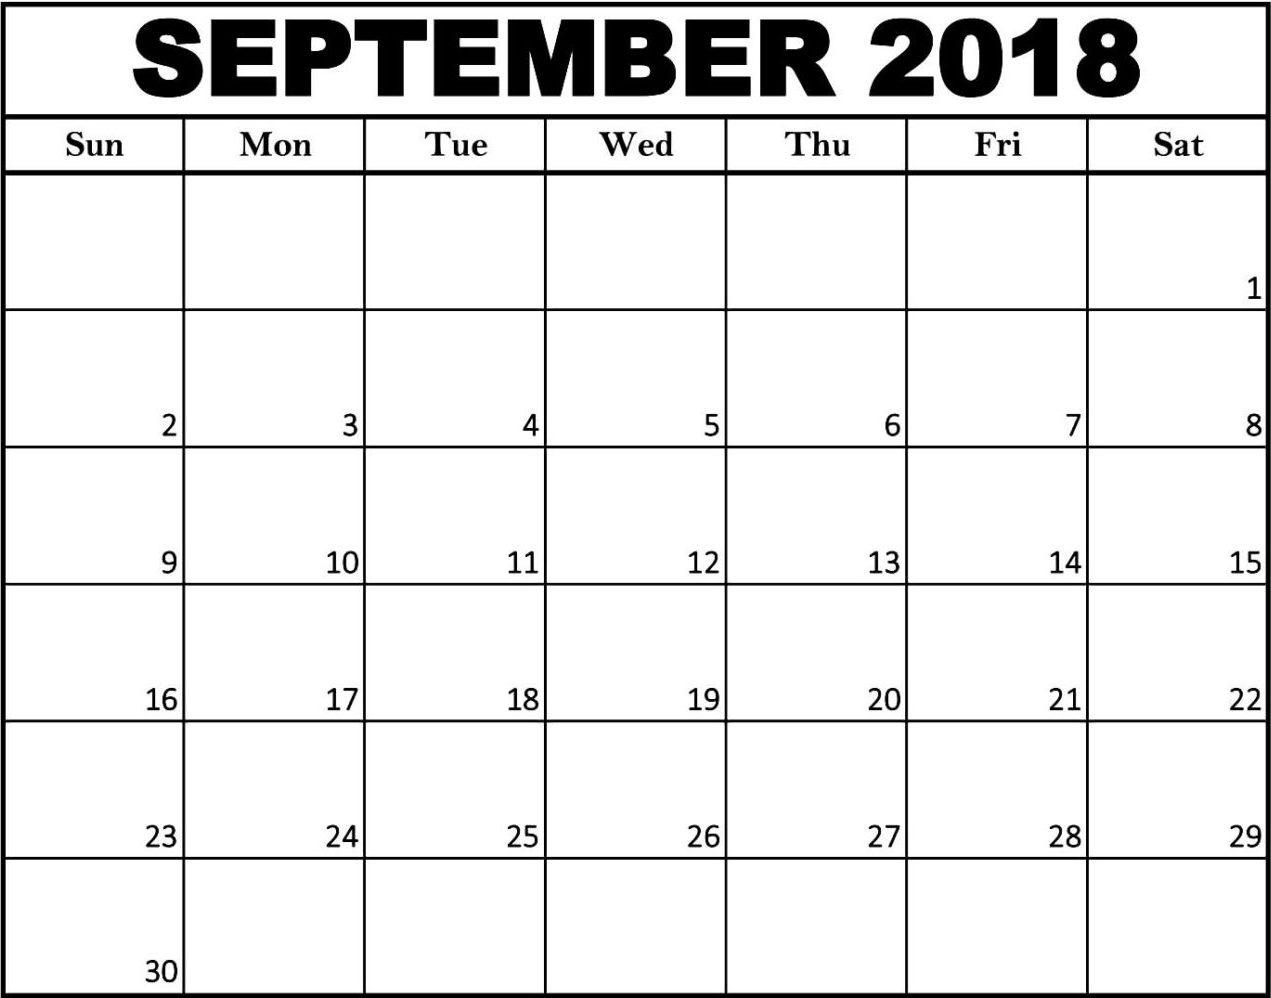 Blank September 2018 Calendar Printable Free – Printable Calendar  Blank Calendar To Fill In Free